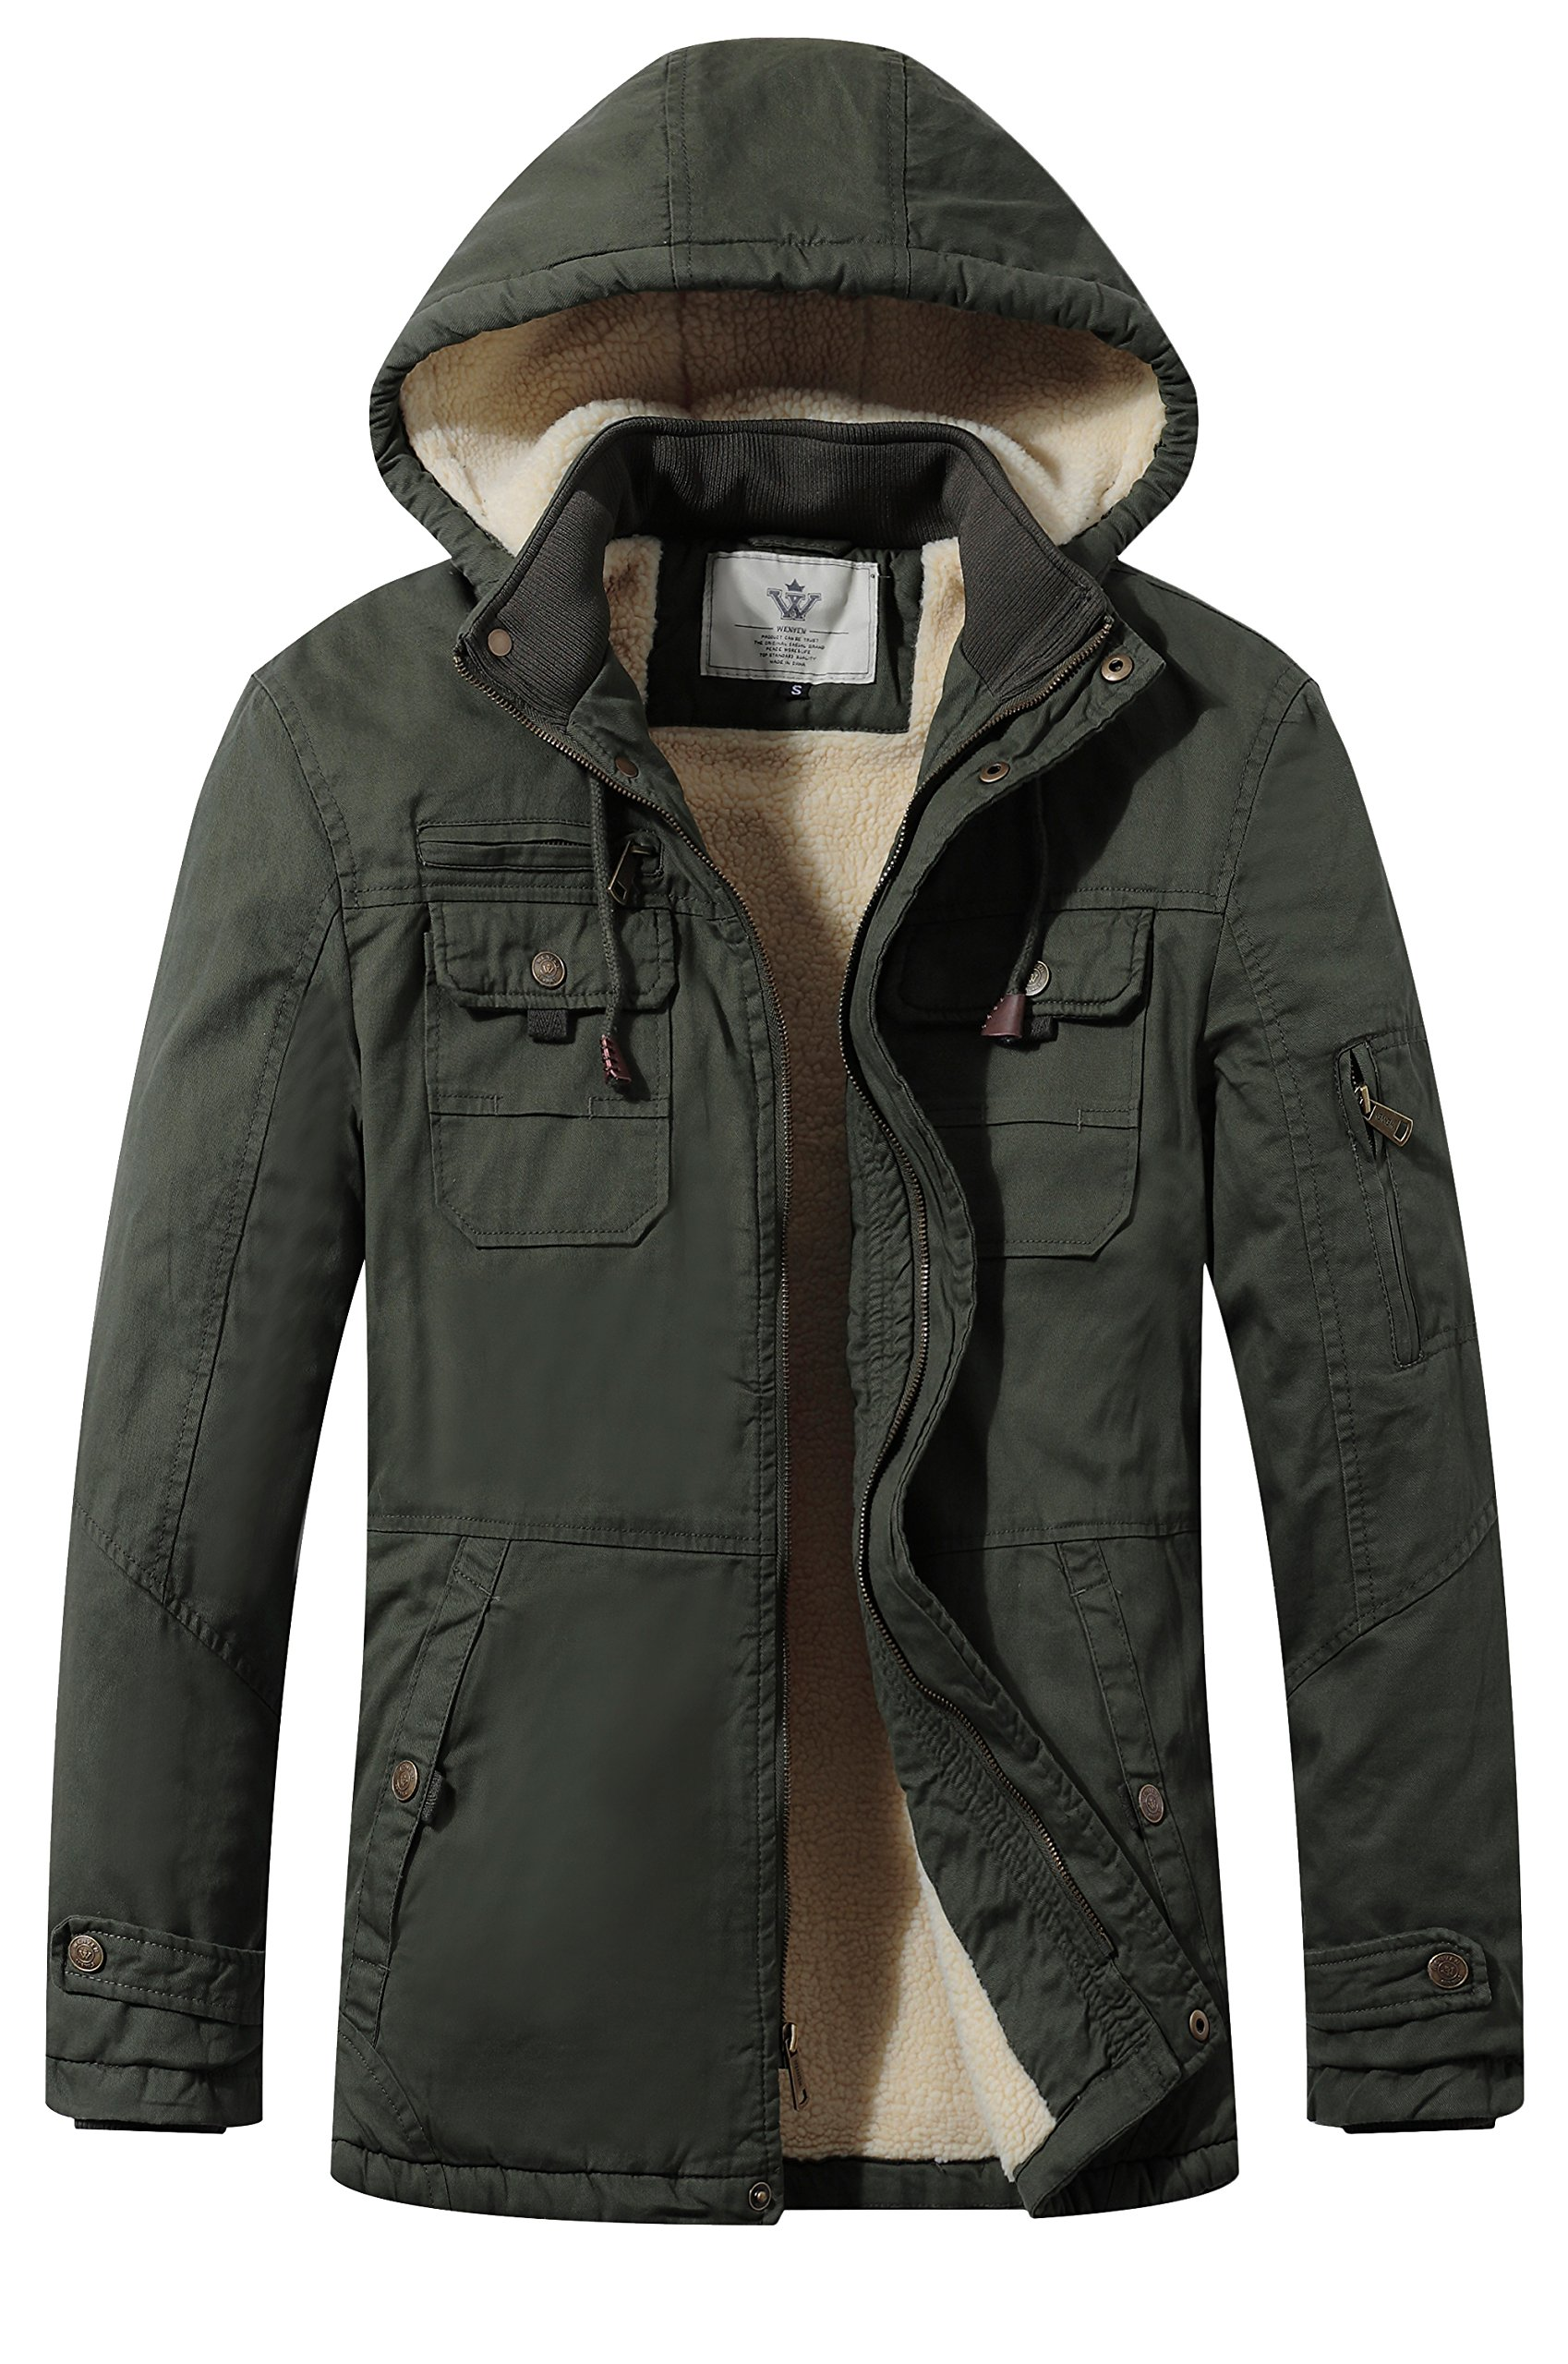 WenVen Men's Lightweight Washed Cotton Hooded Jacket(Army Green,Medium)